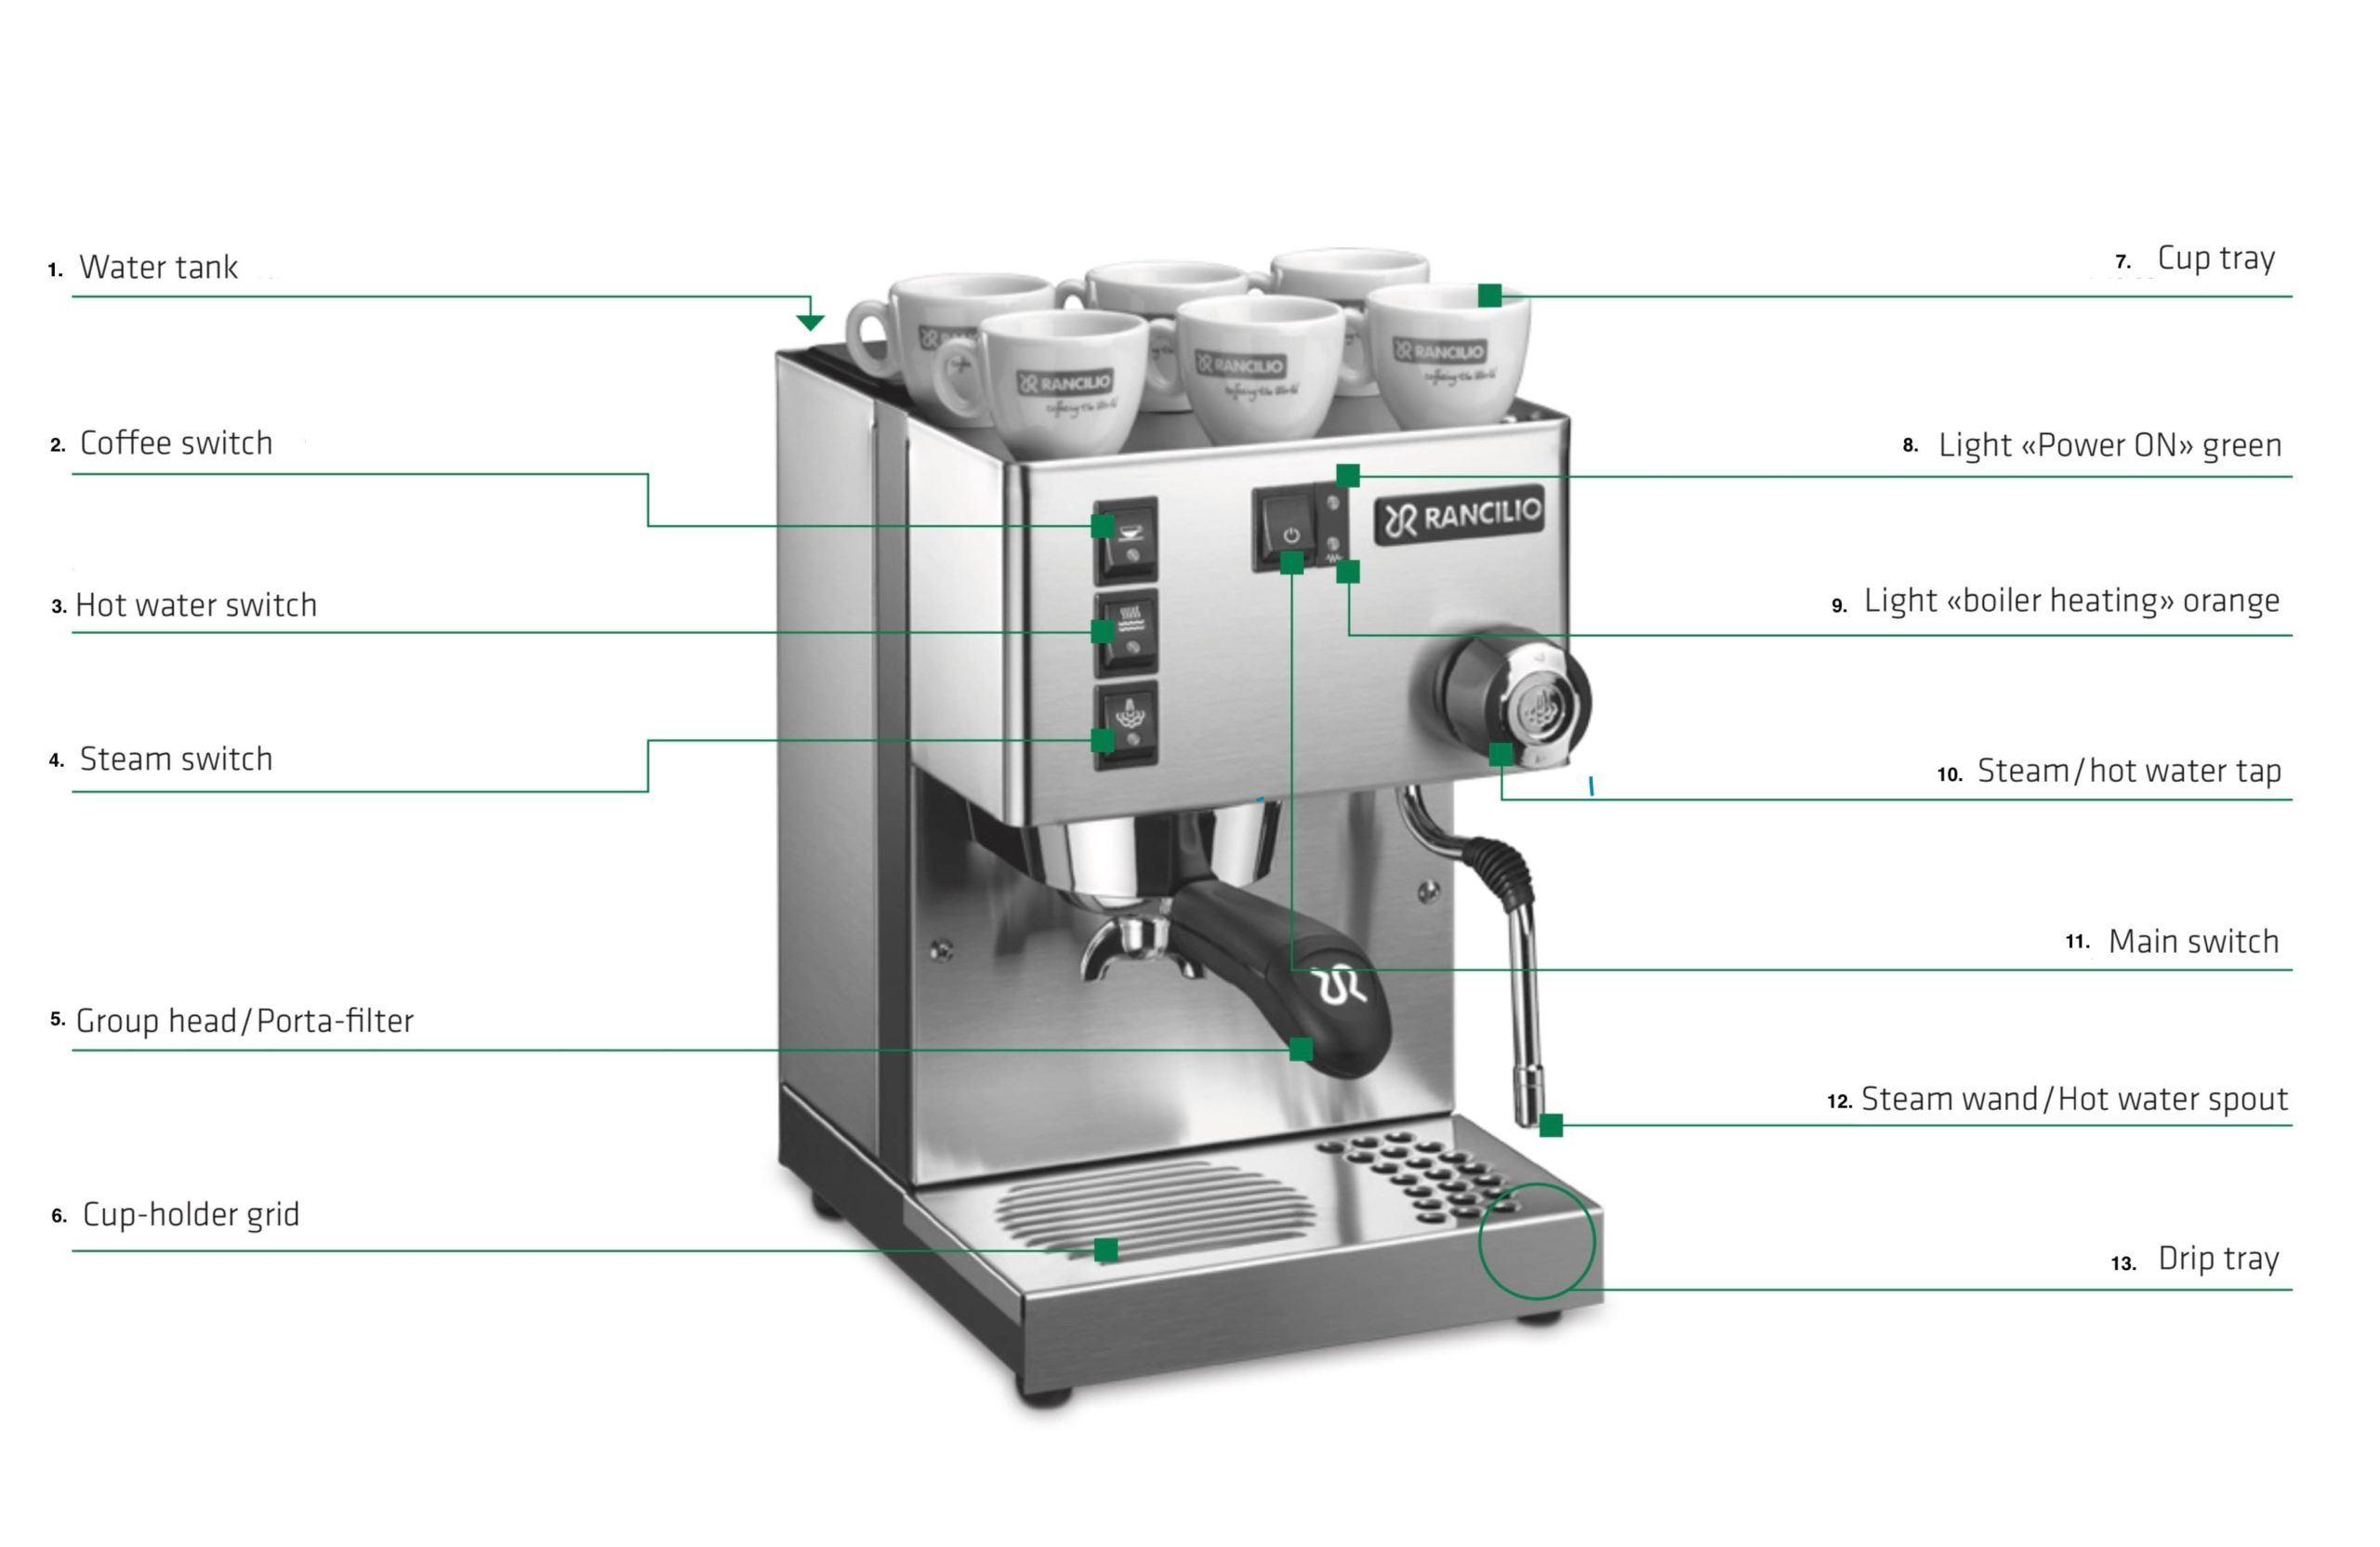 Rancilio Silvia Espresso Machine Overview Parts Identification. 1) Water Tank 2)Coffee Switch 3) Hot water switch 4) Steam switch 5)